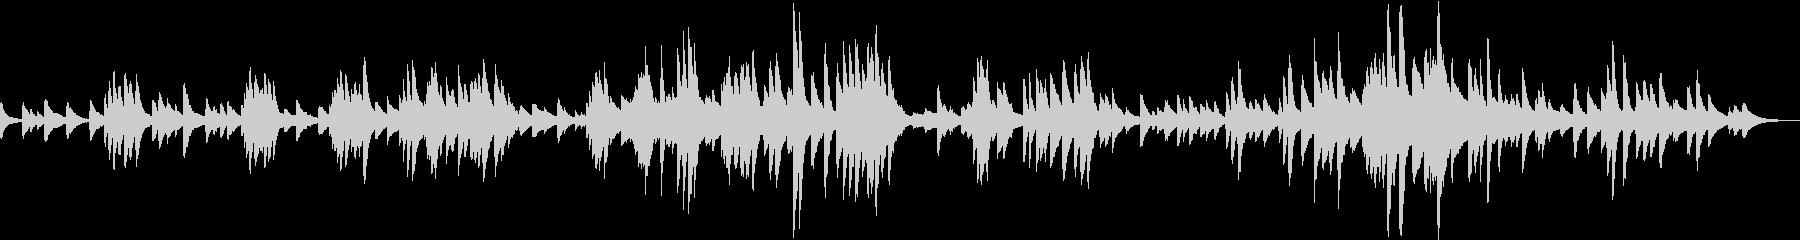 G線上のアリア ジャズ風アレンジ ピアノの未再生の波形